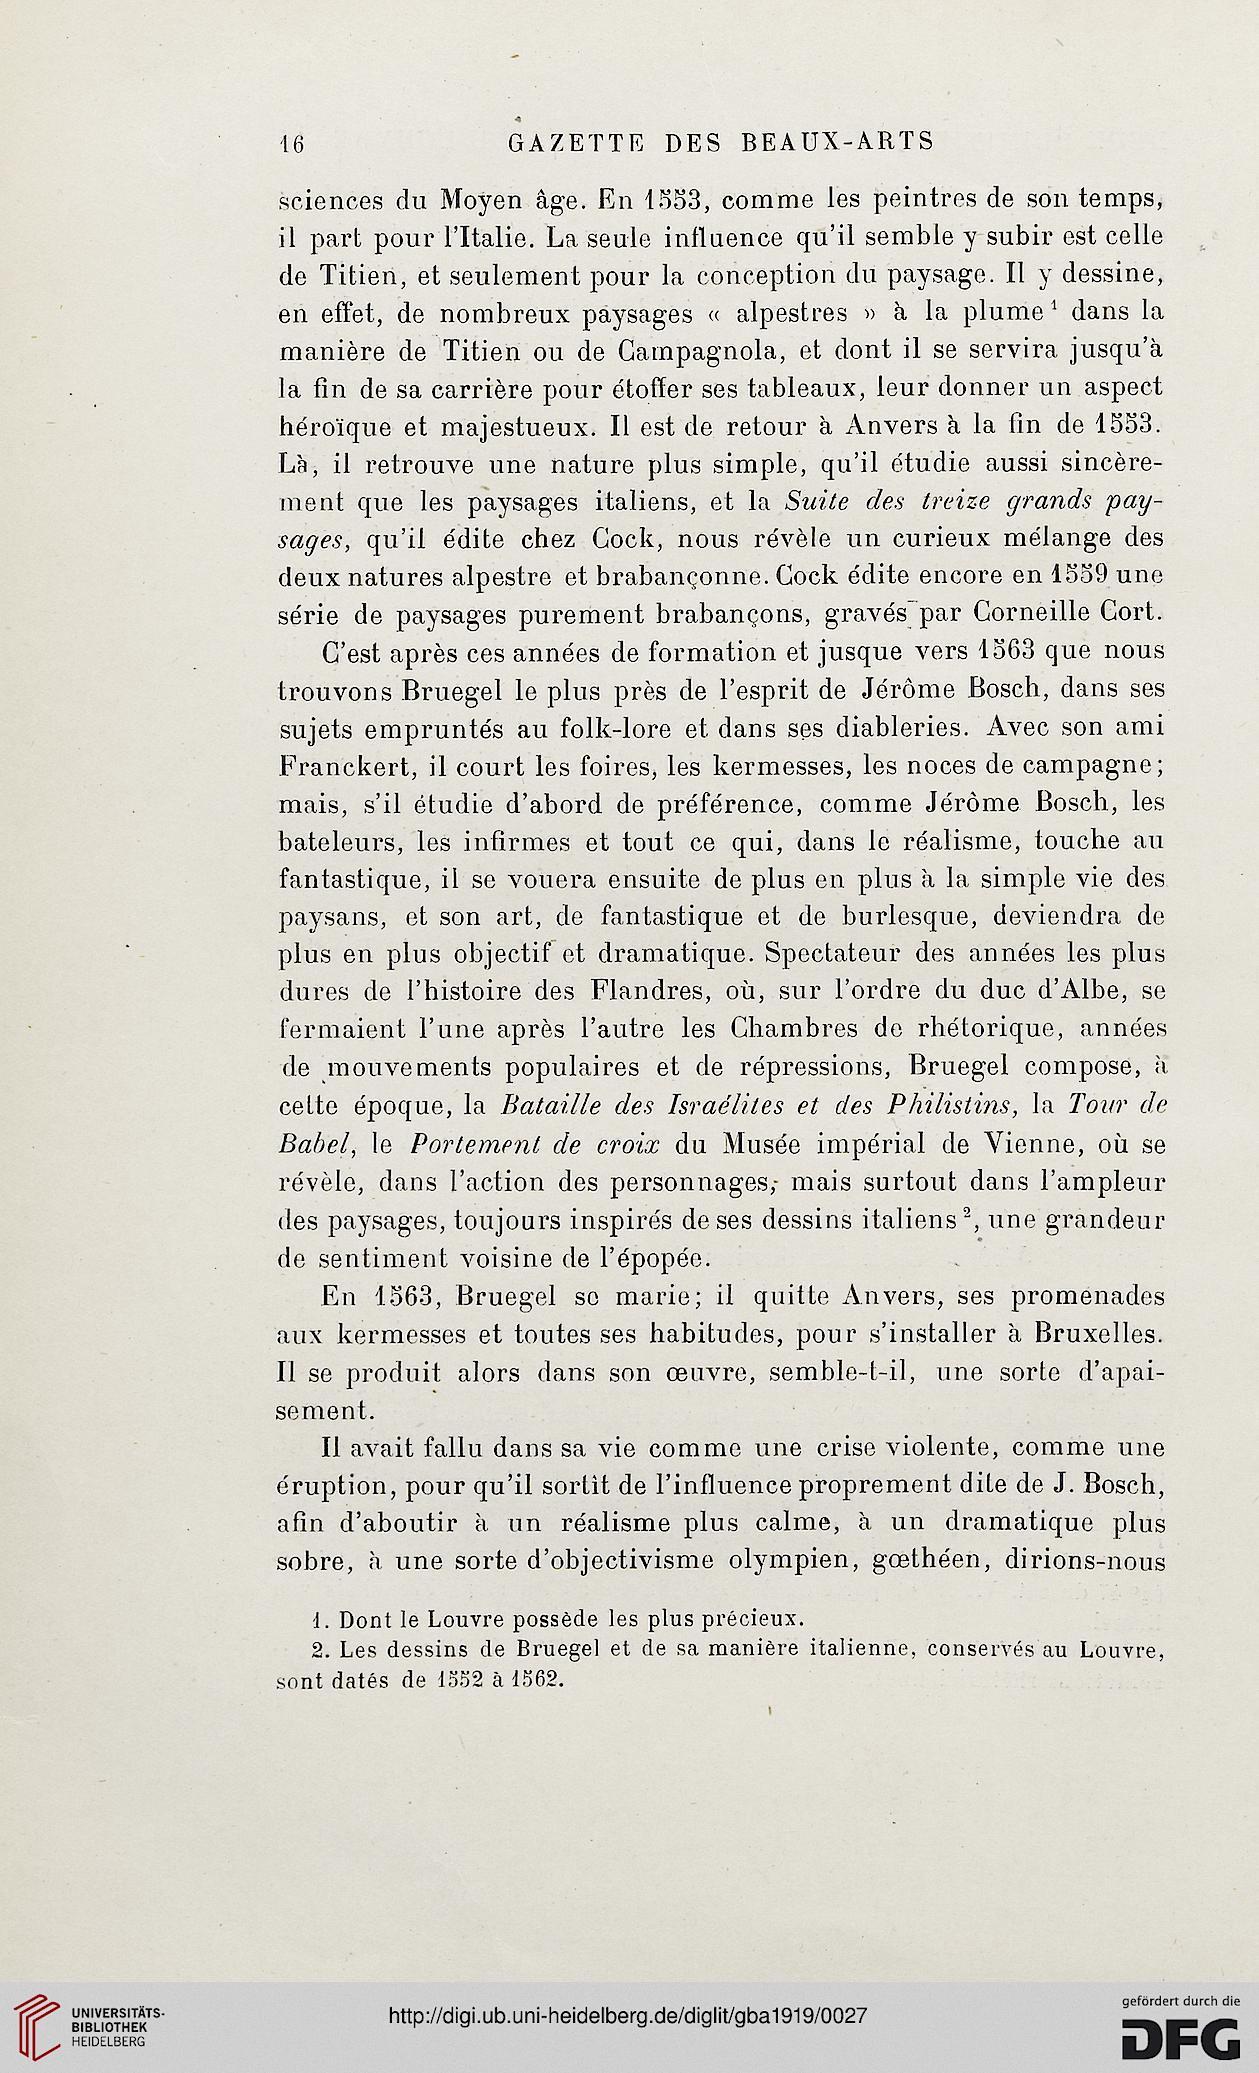 Gazette Des Beaux Arts La Doyenne Revues Dart 4 Per 151919